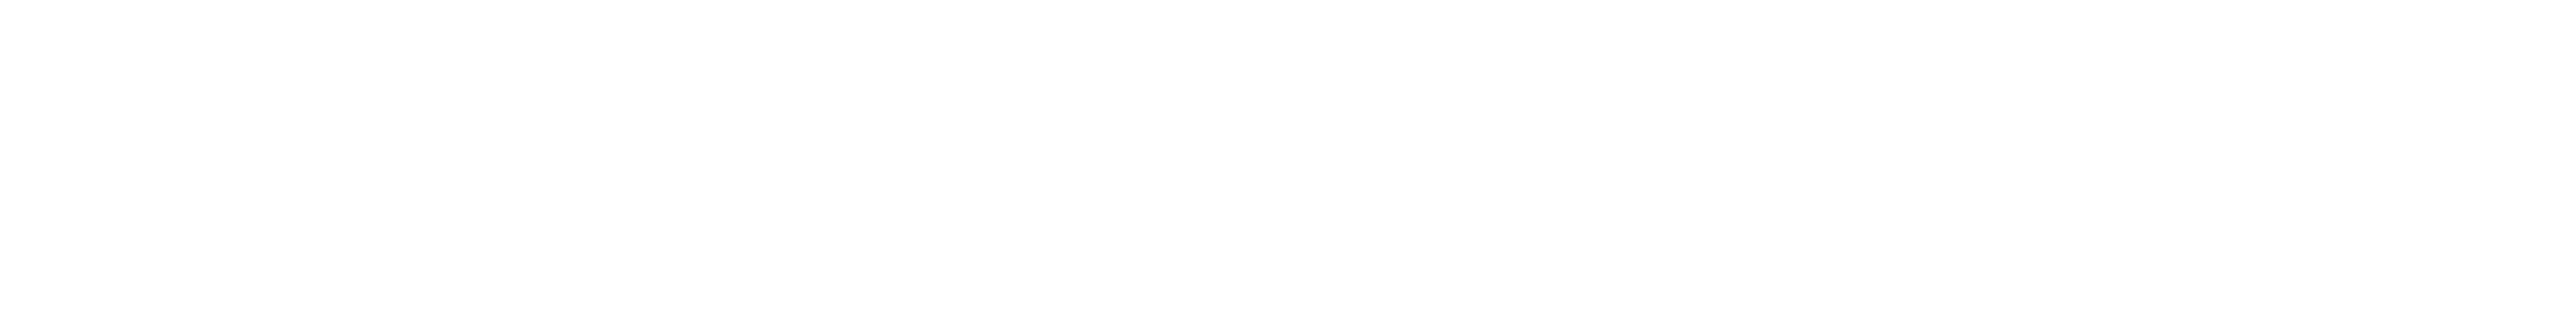 Lazos Food & Drinks